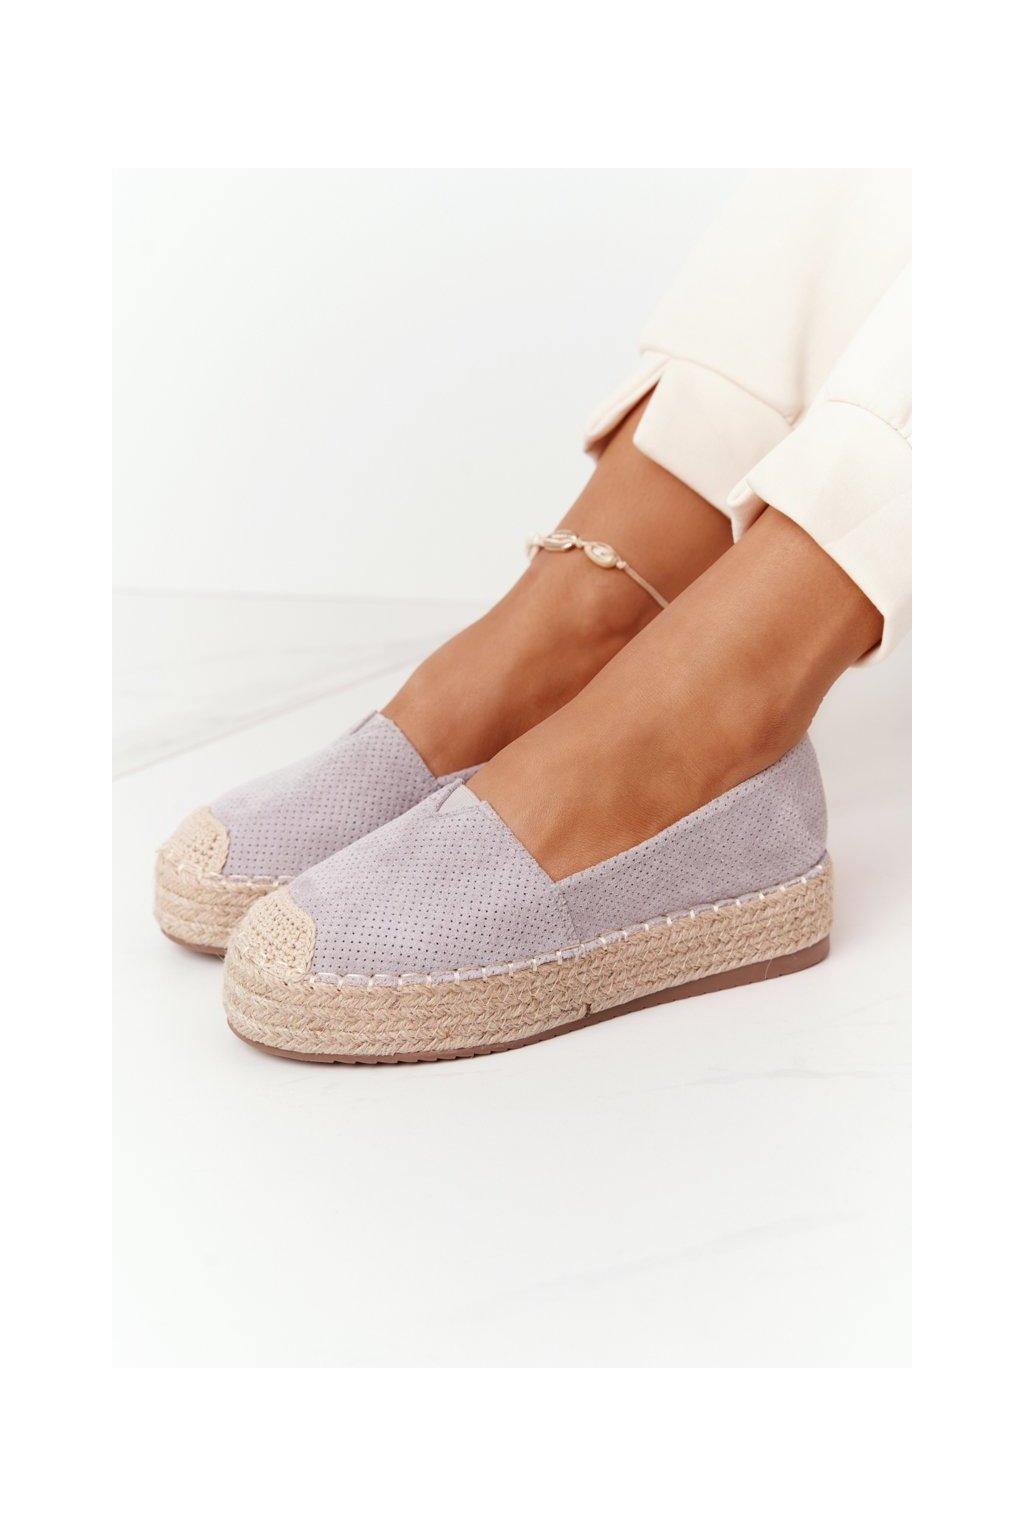 Dámske tenisky farba sivá kód obuvi BL1922-26 GREY